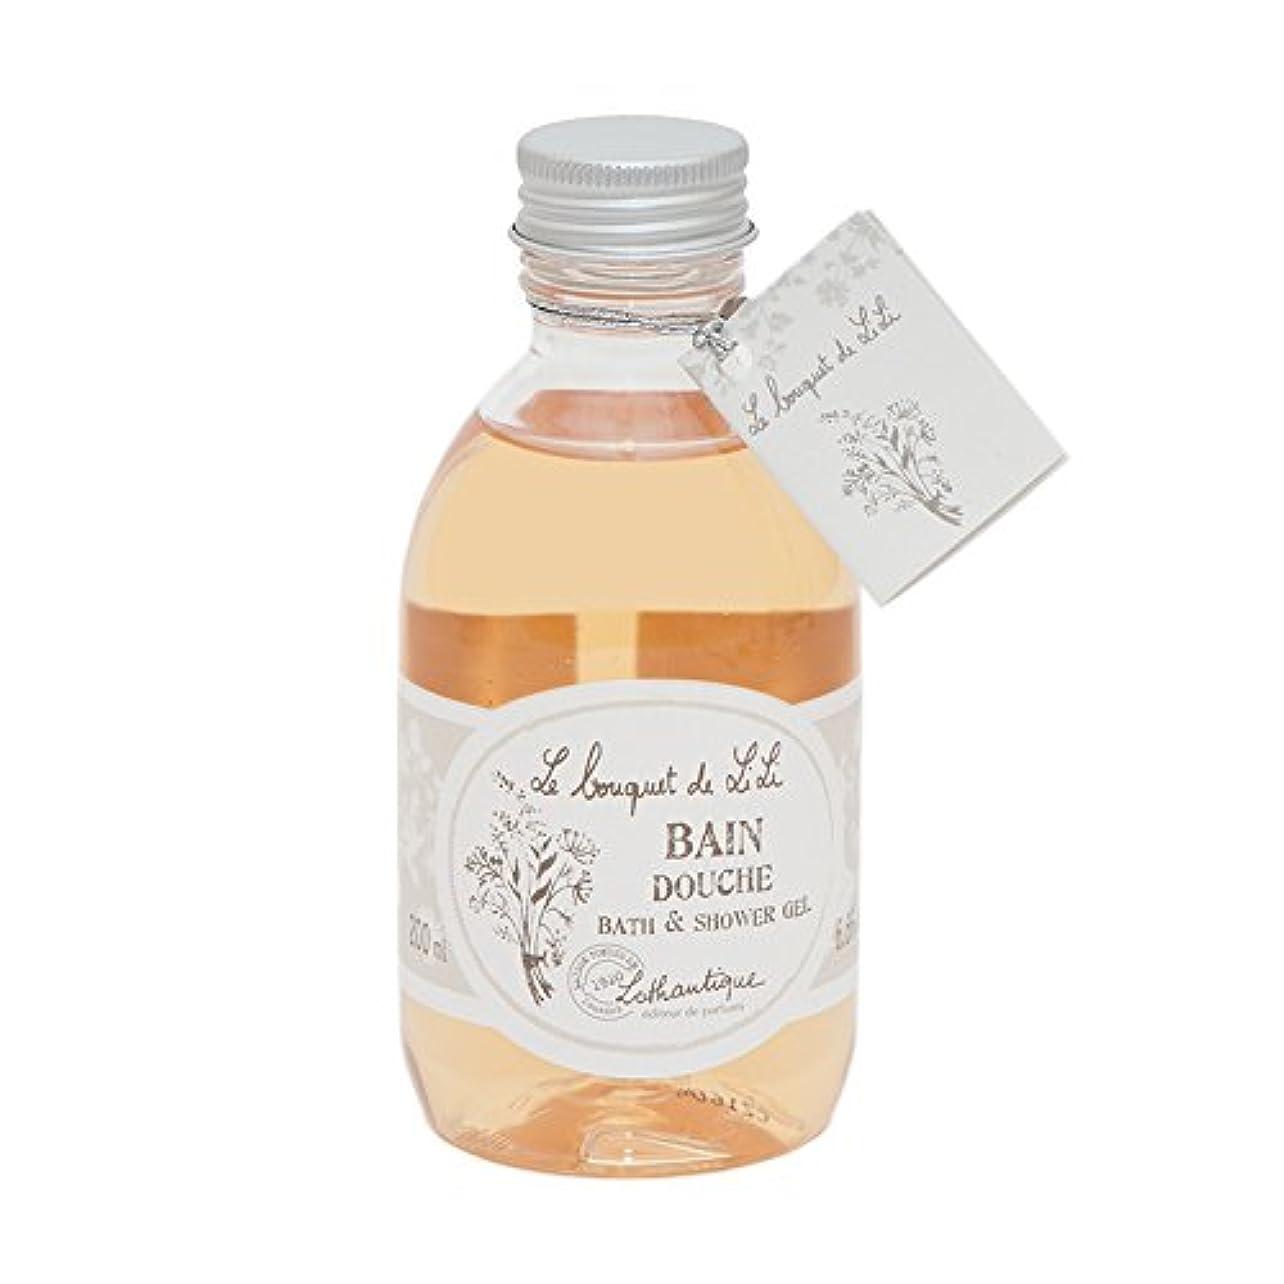 Lothantique(ロタンティック) Le bouquet de LiLi(ブーケドゥリリシリーズ) ボディウォッシュ 200ml 3420070029034